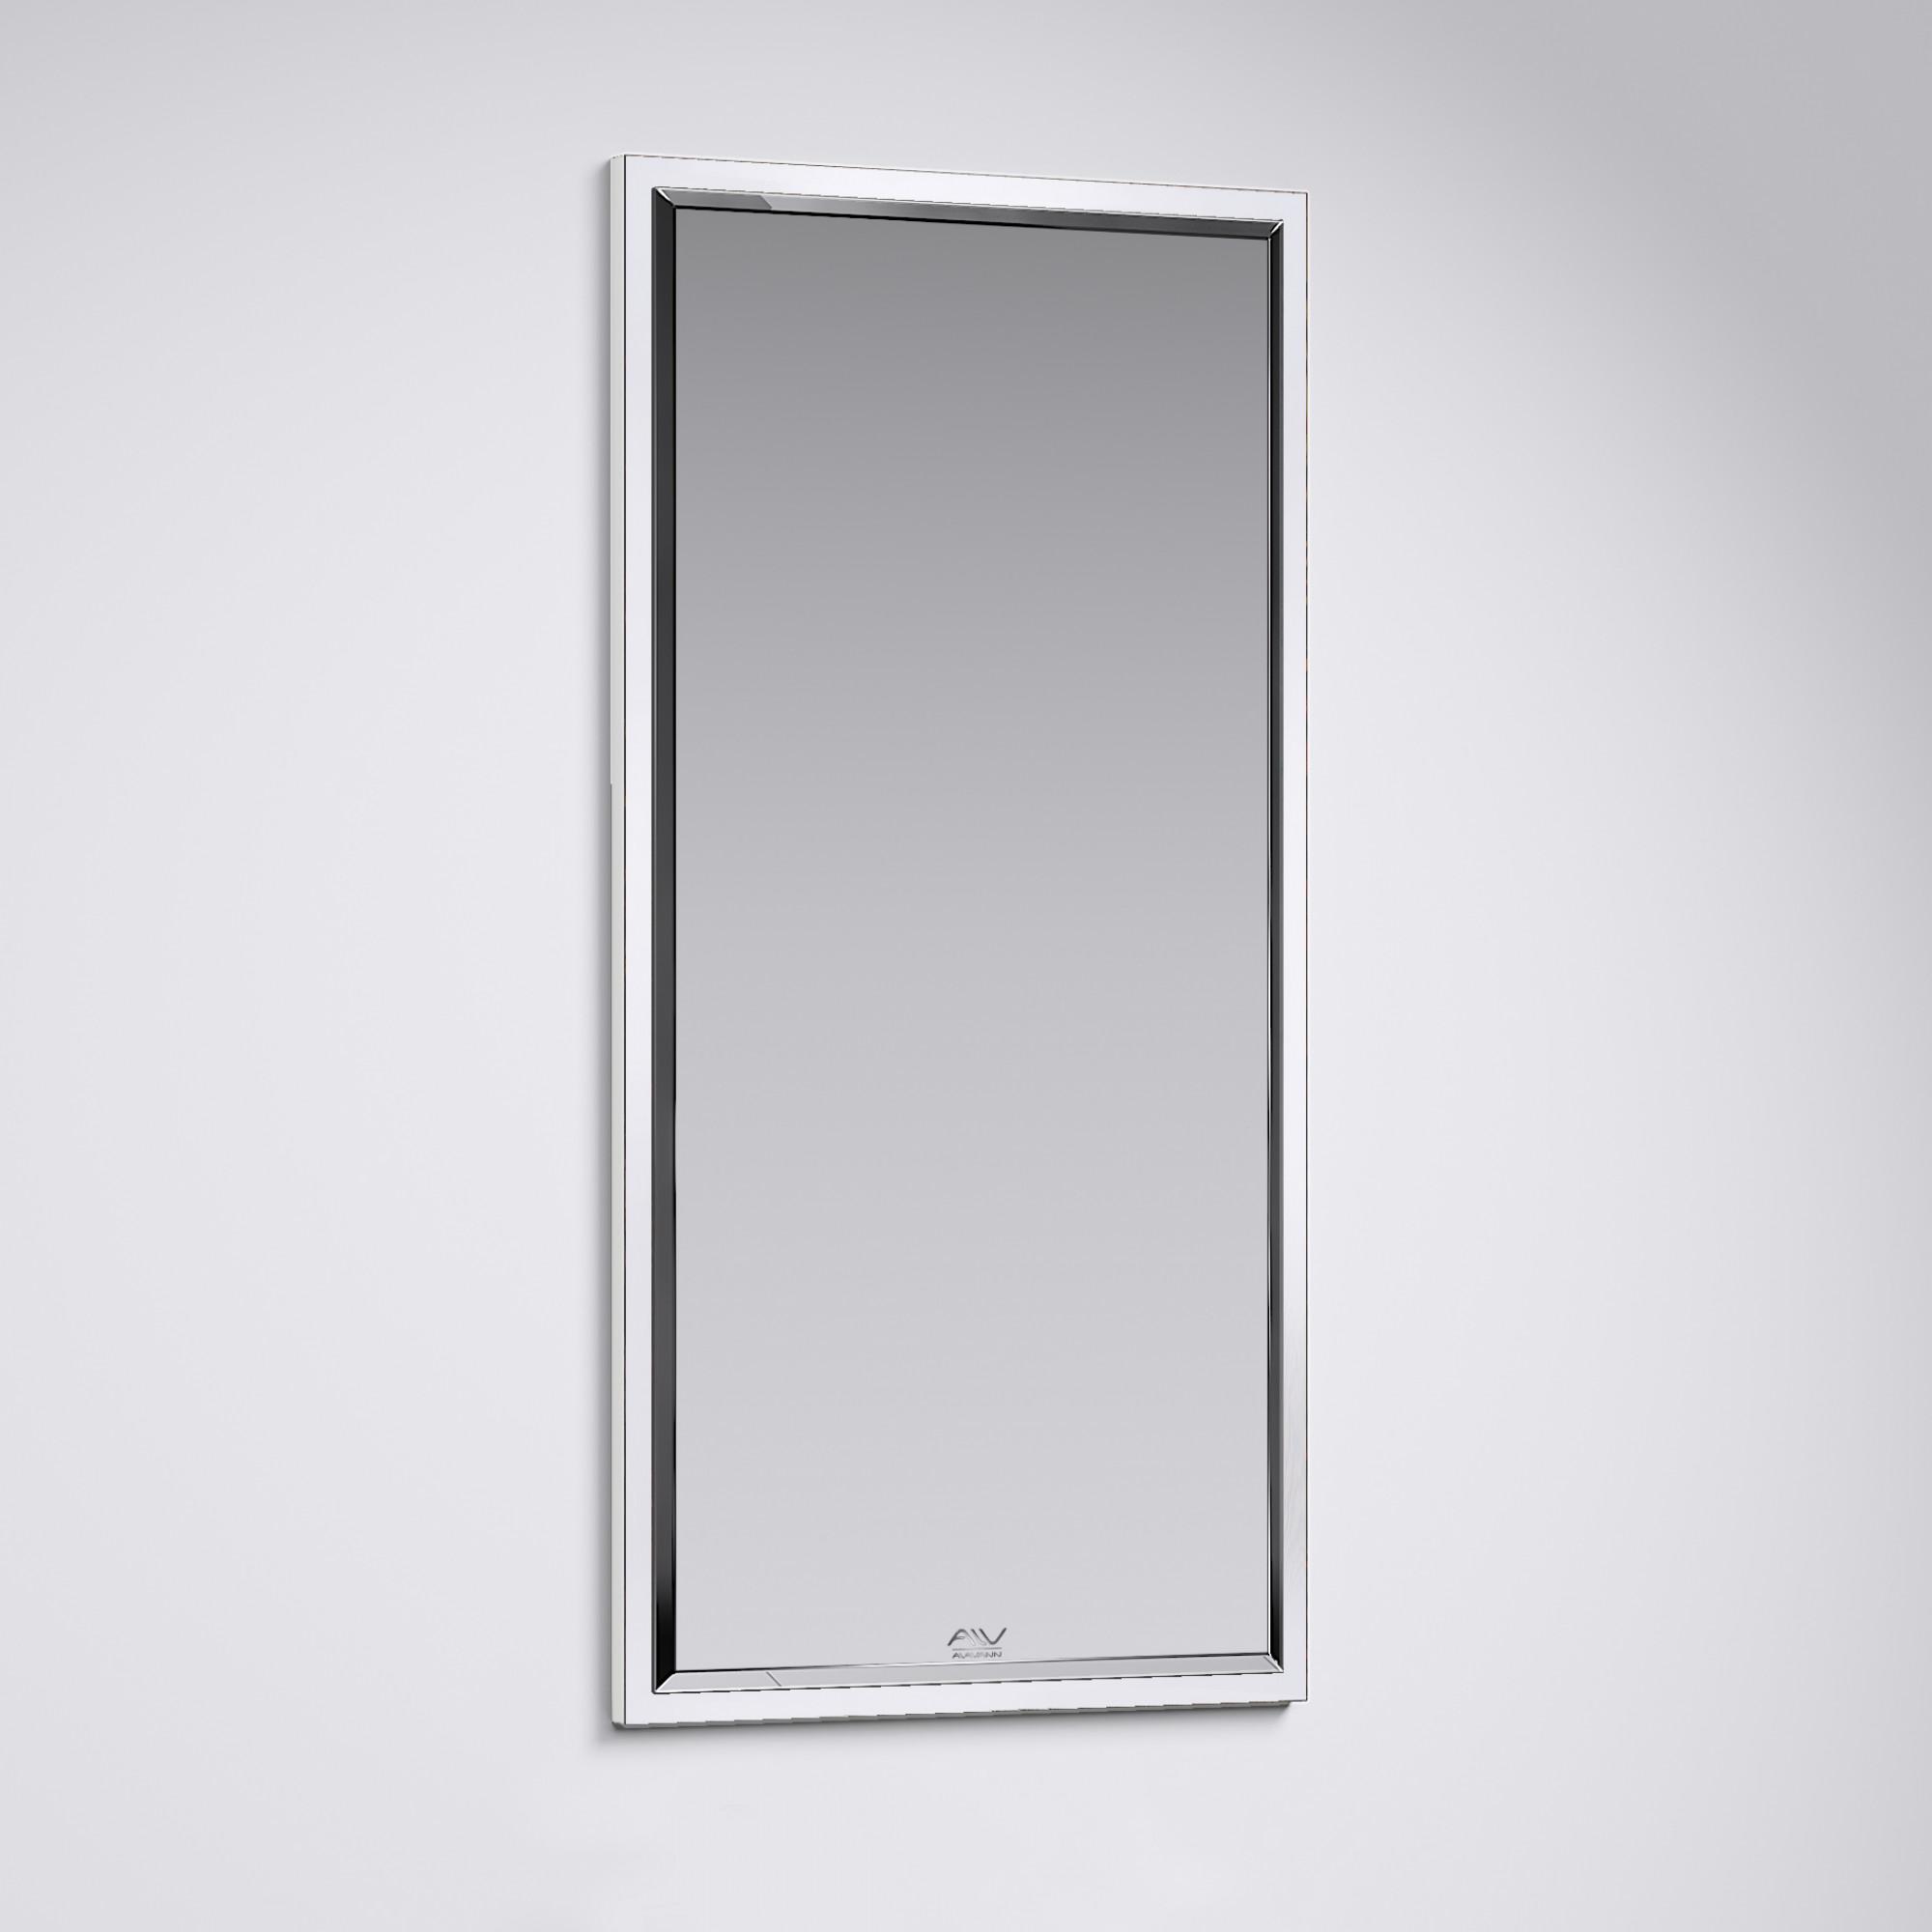 Зеркало Кантри 40 белый +2 800 руб.